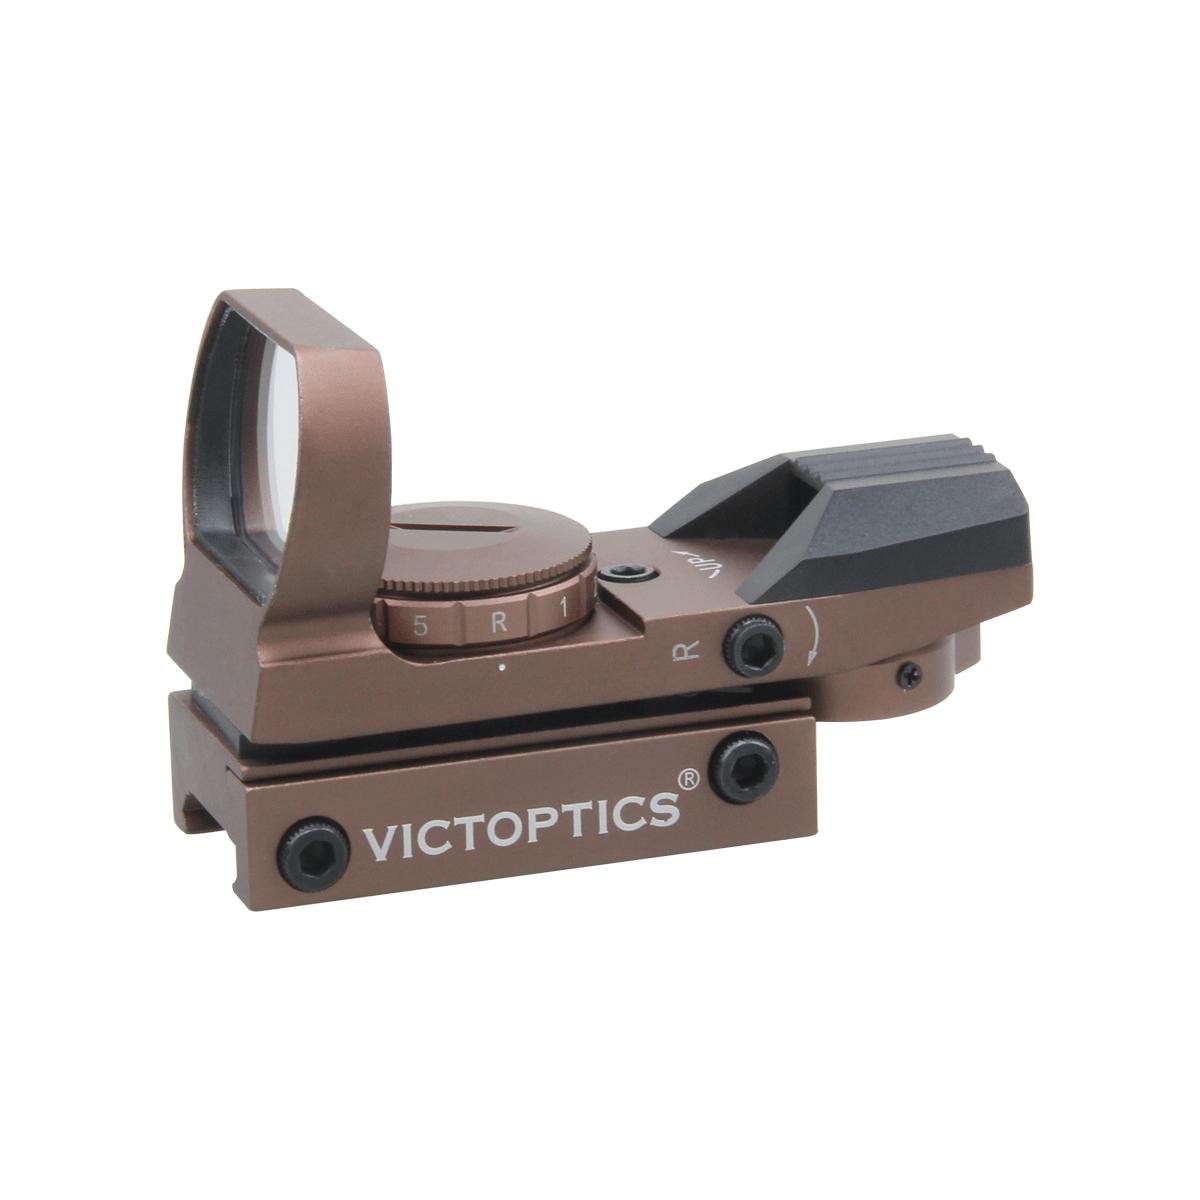 VictOptics 1x23x34 Red Dot Sight Coyote FDE